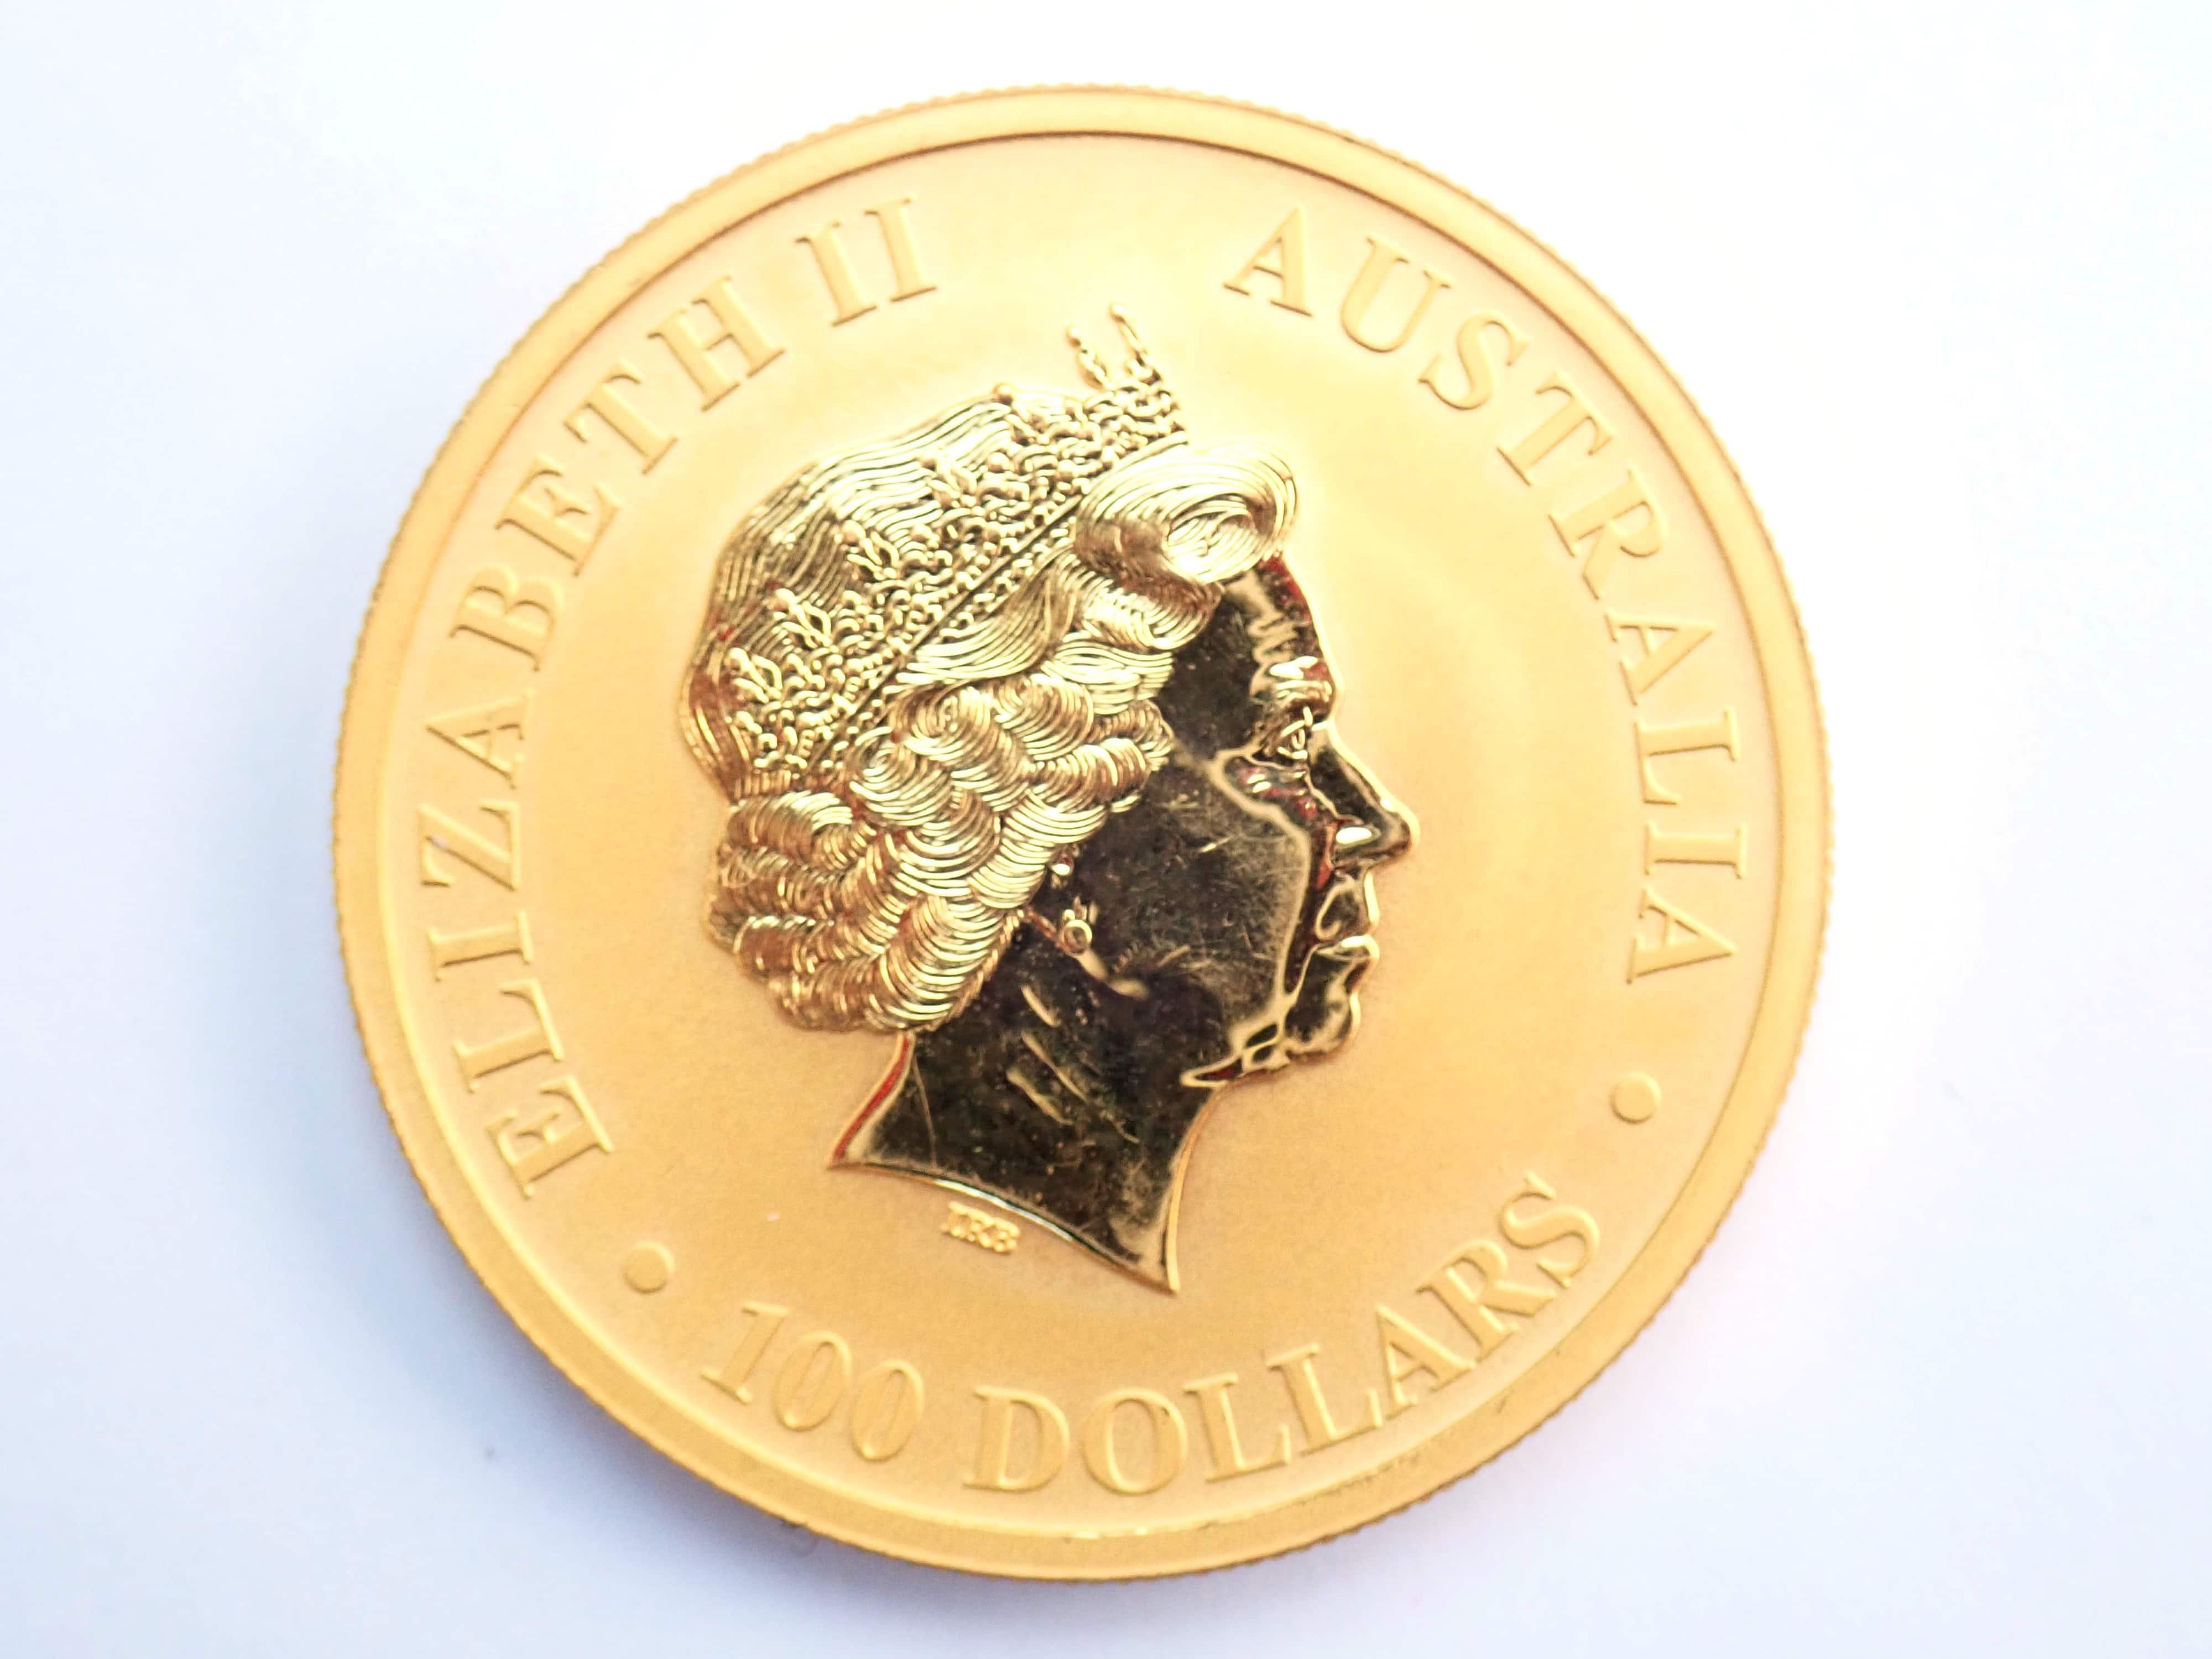 AA000799 - 2011 1oz Pure gold 24k Australian Nugget Kangaroo $100 Dollars Coin #0041